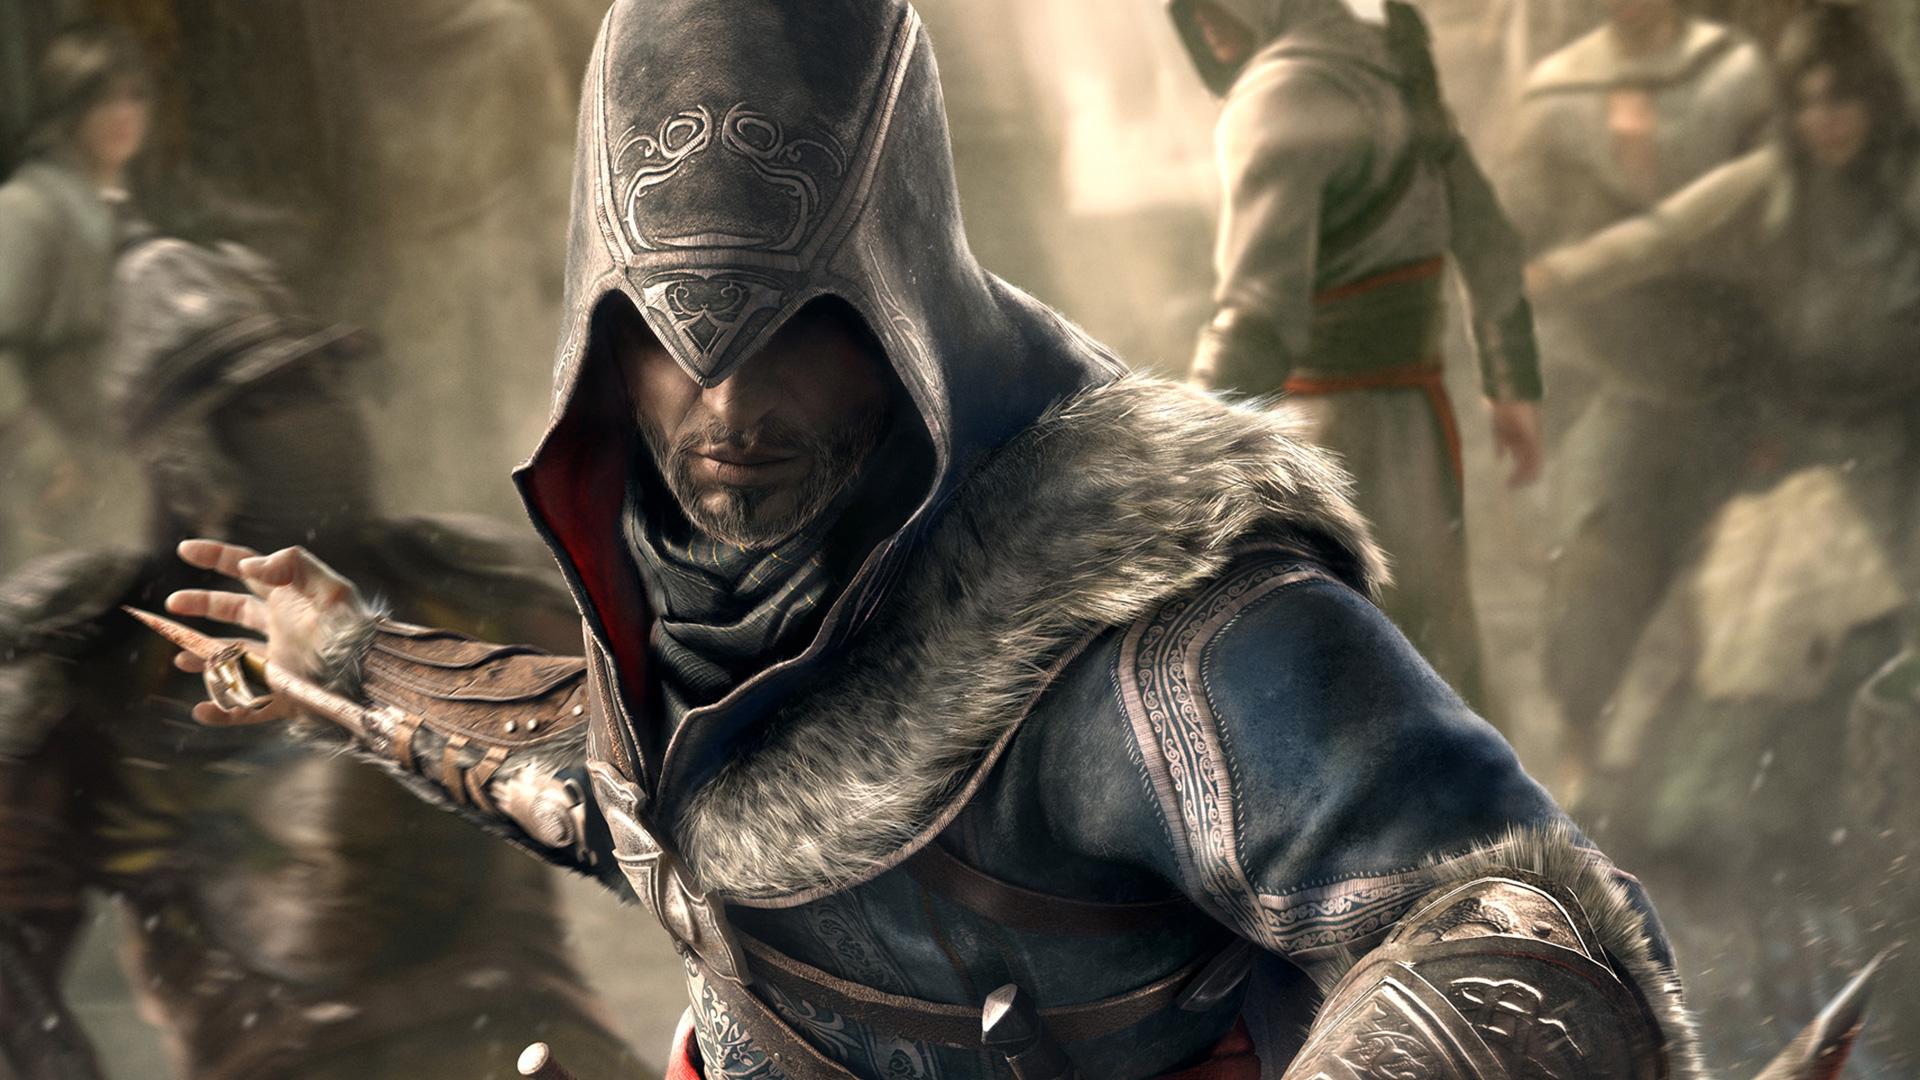 Assassins Creed Revelations Wallpapers 8 HD Desktop Wallpapers 1920x1080